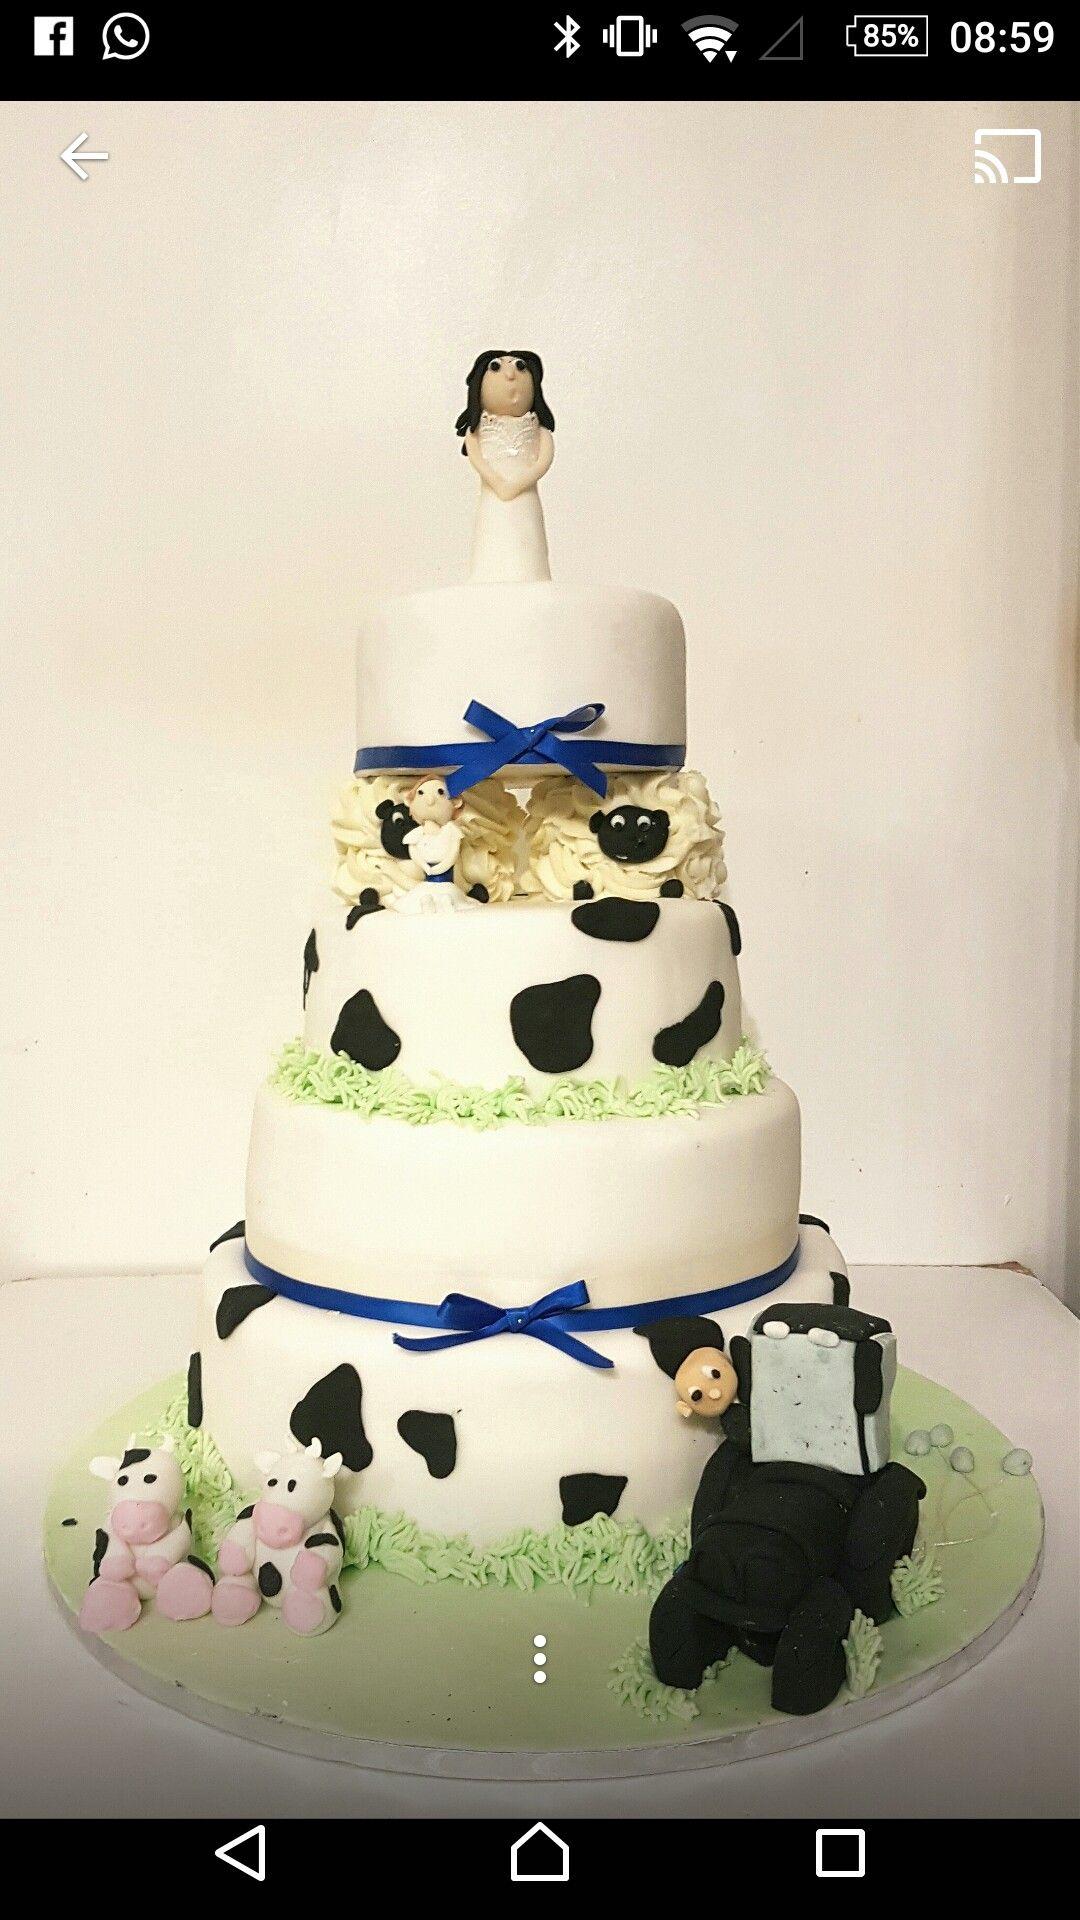 Pin By Brenda Dickson On Cakes Pinterest Themed Wedding Cakes